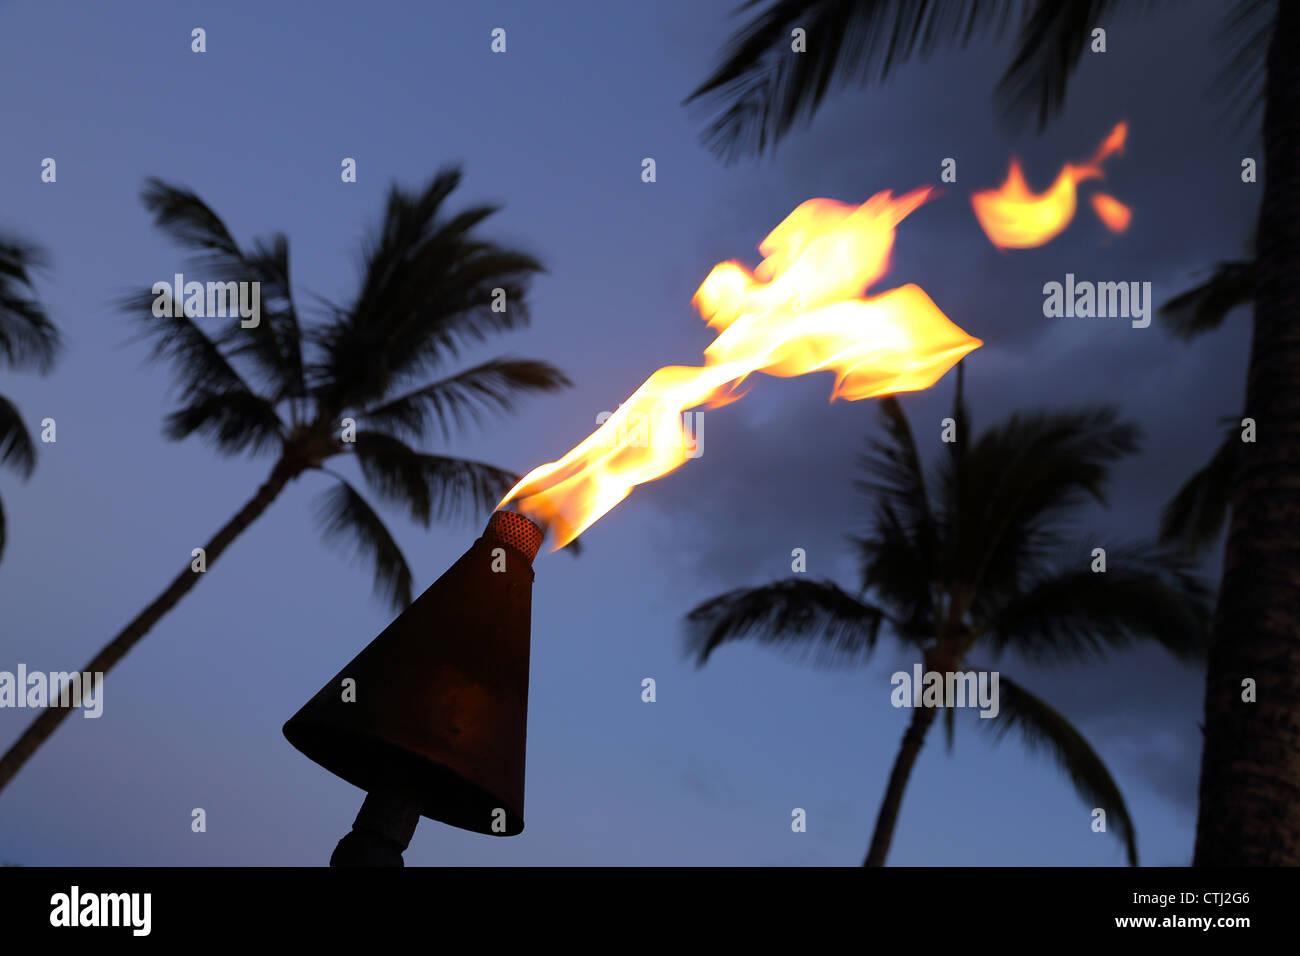 Flaming torch and palm trees at night, Hawaii Stock Photo